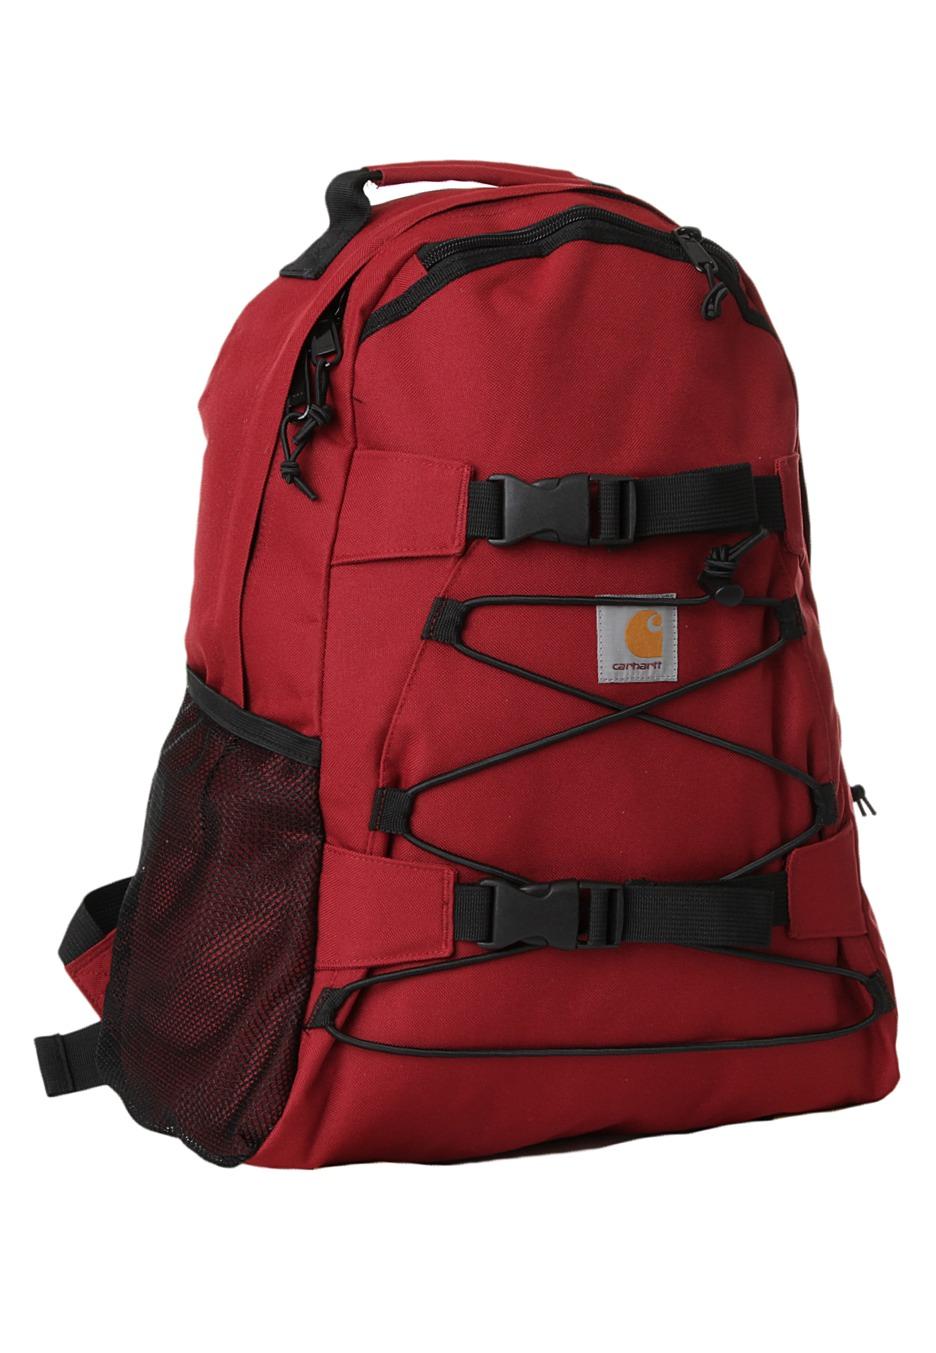 Carhartt WIP - Kickflip Grape - Backpack - Streetwear Shop - Impericon.com  AU